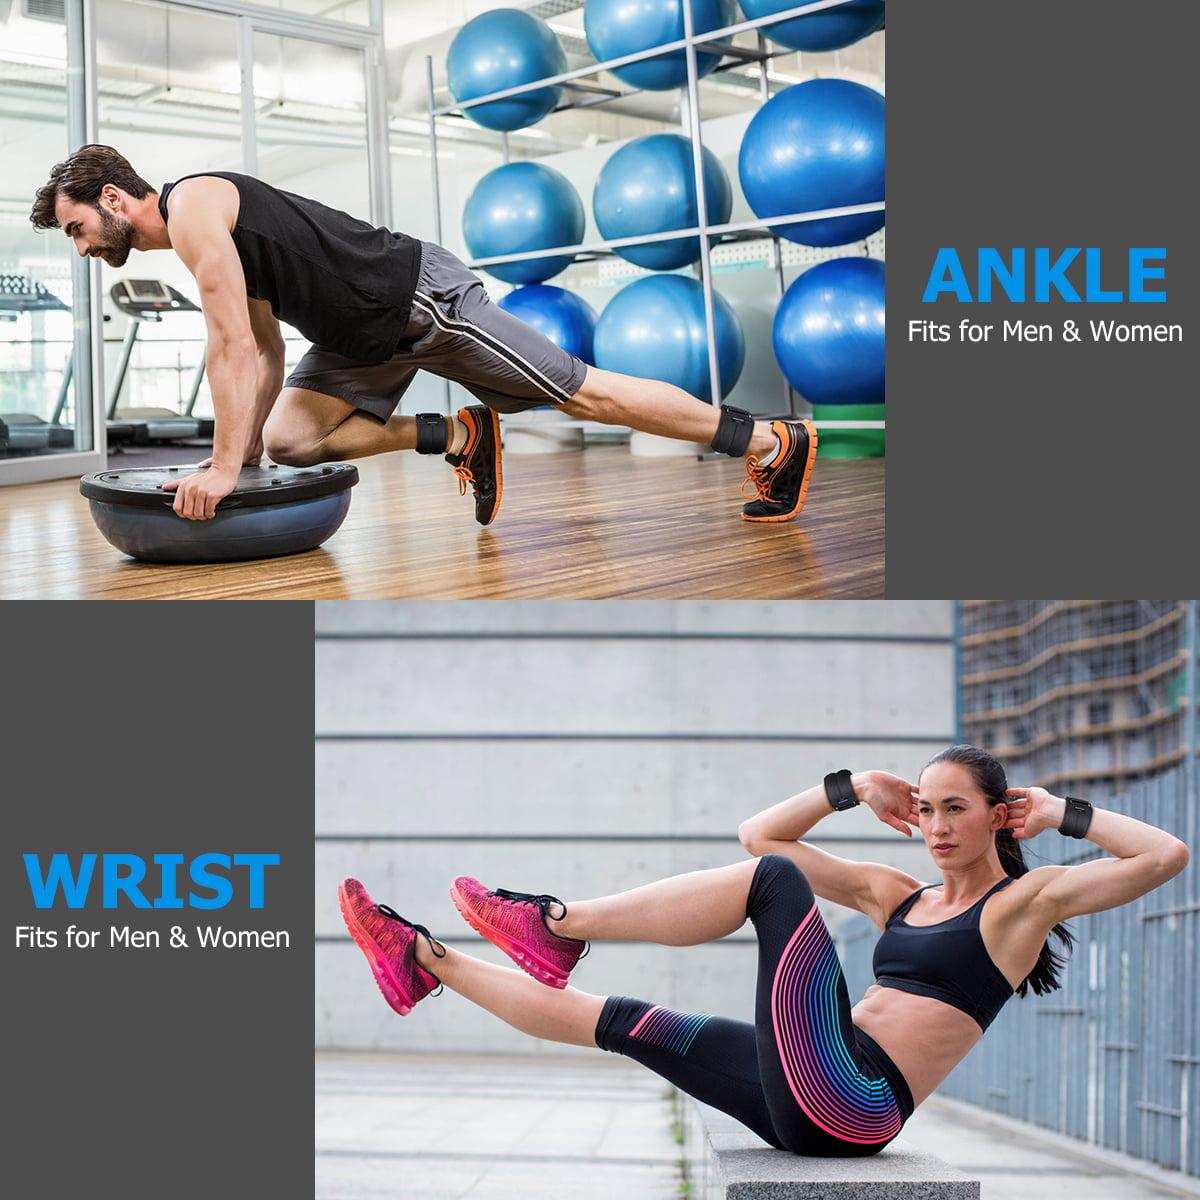 2PCS Ankle Weights Adjustable Leg Wrist Straps Running Boxing Braclets Training